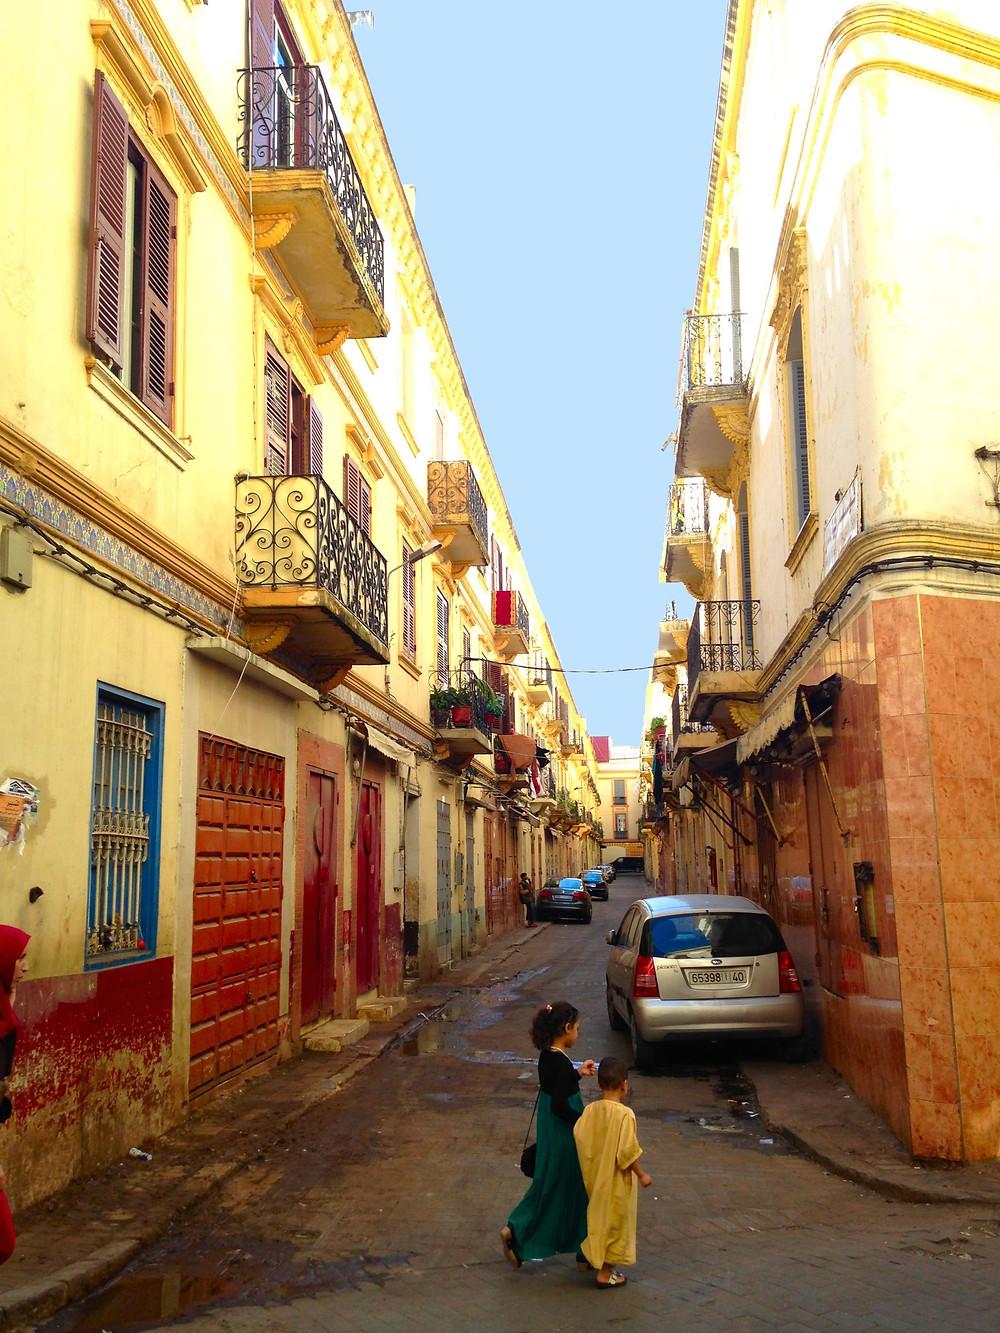 Streets in the Medina Tangier Morocco